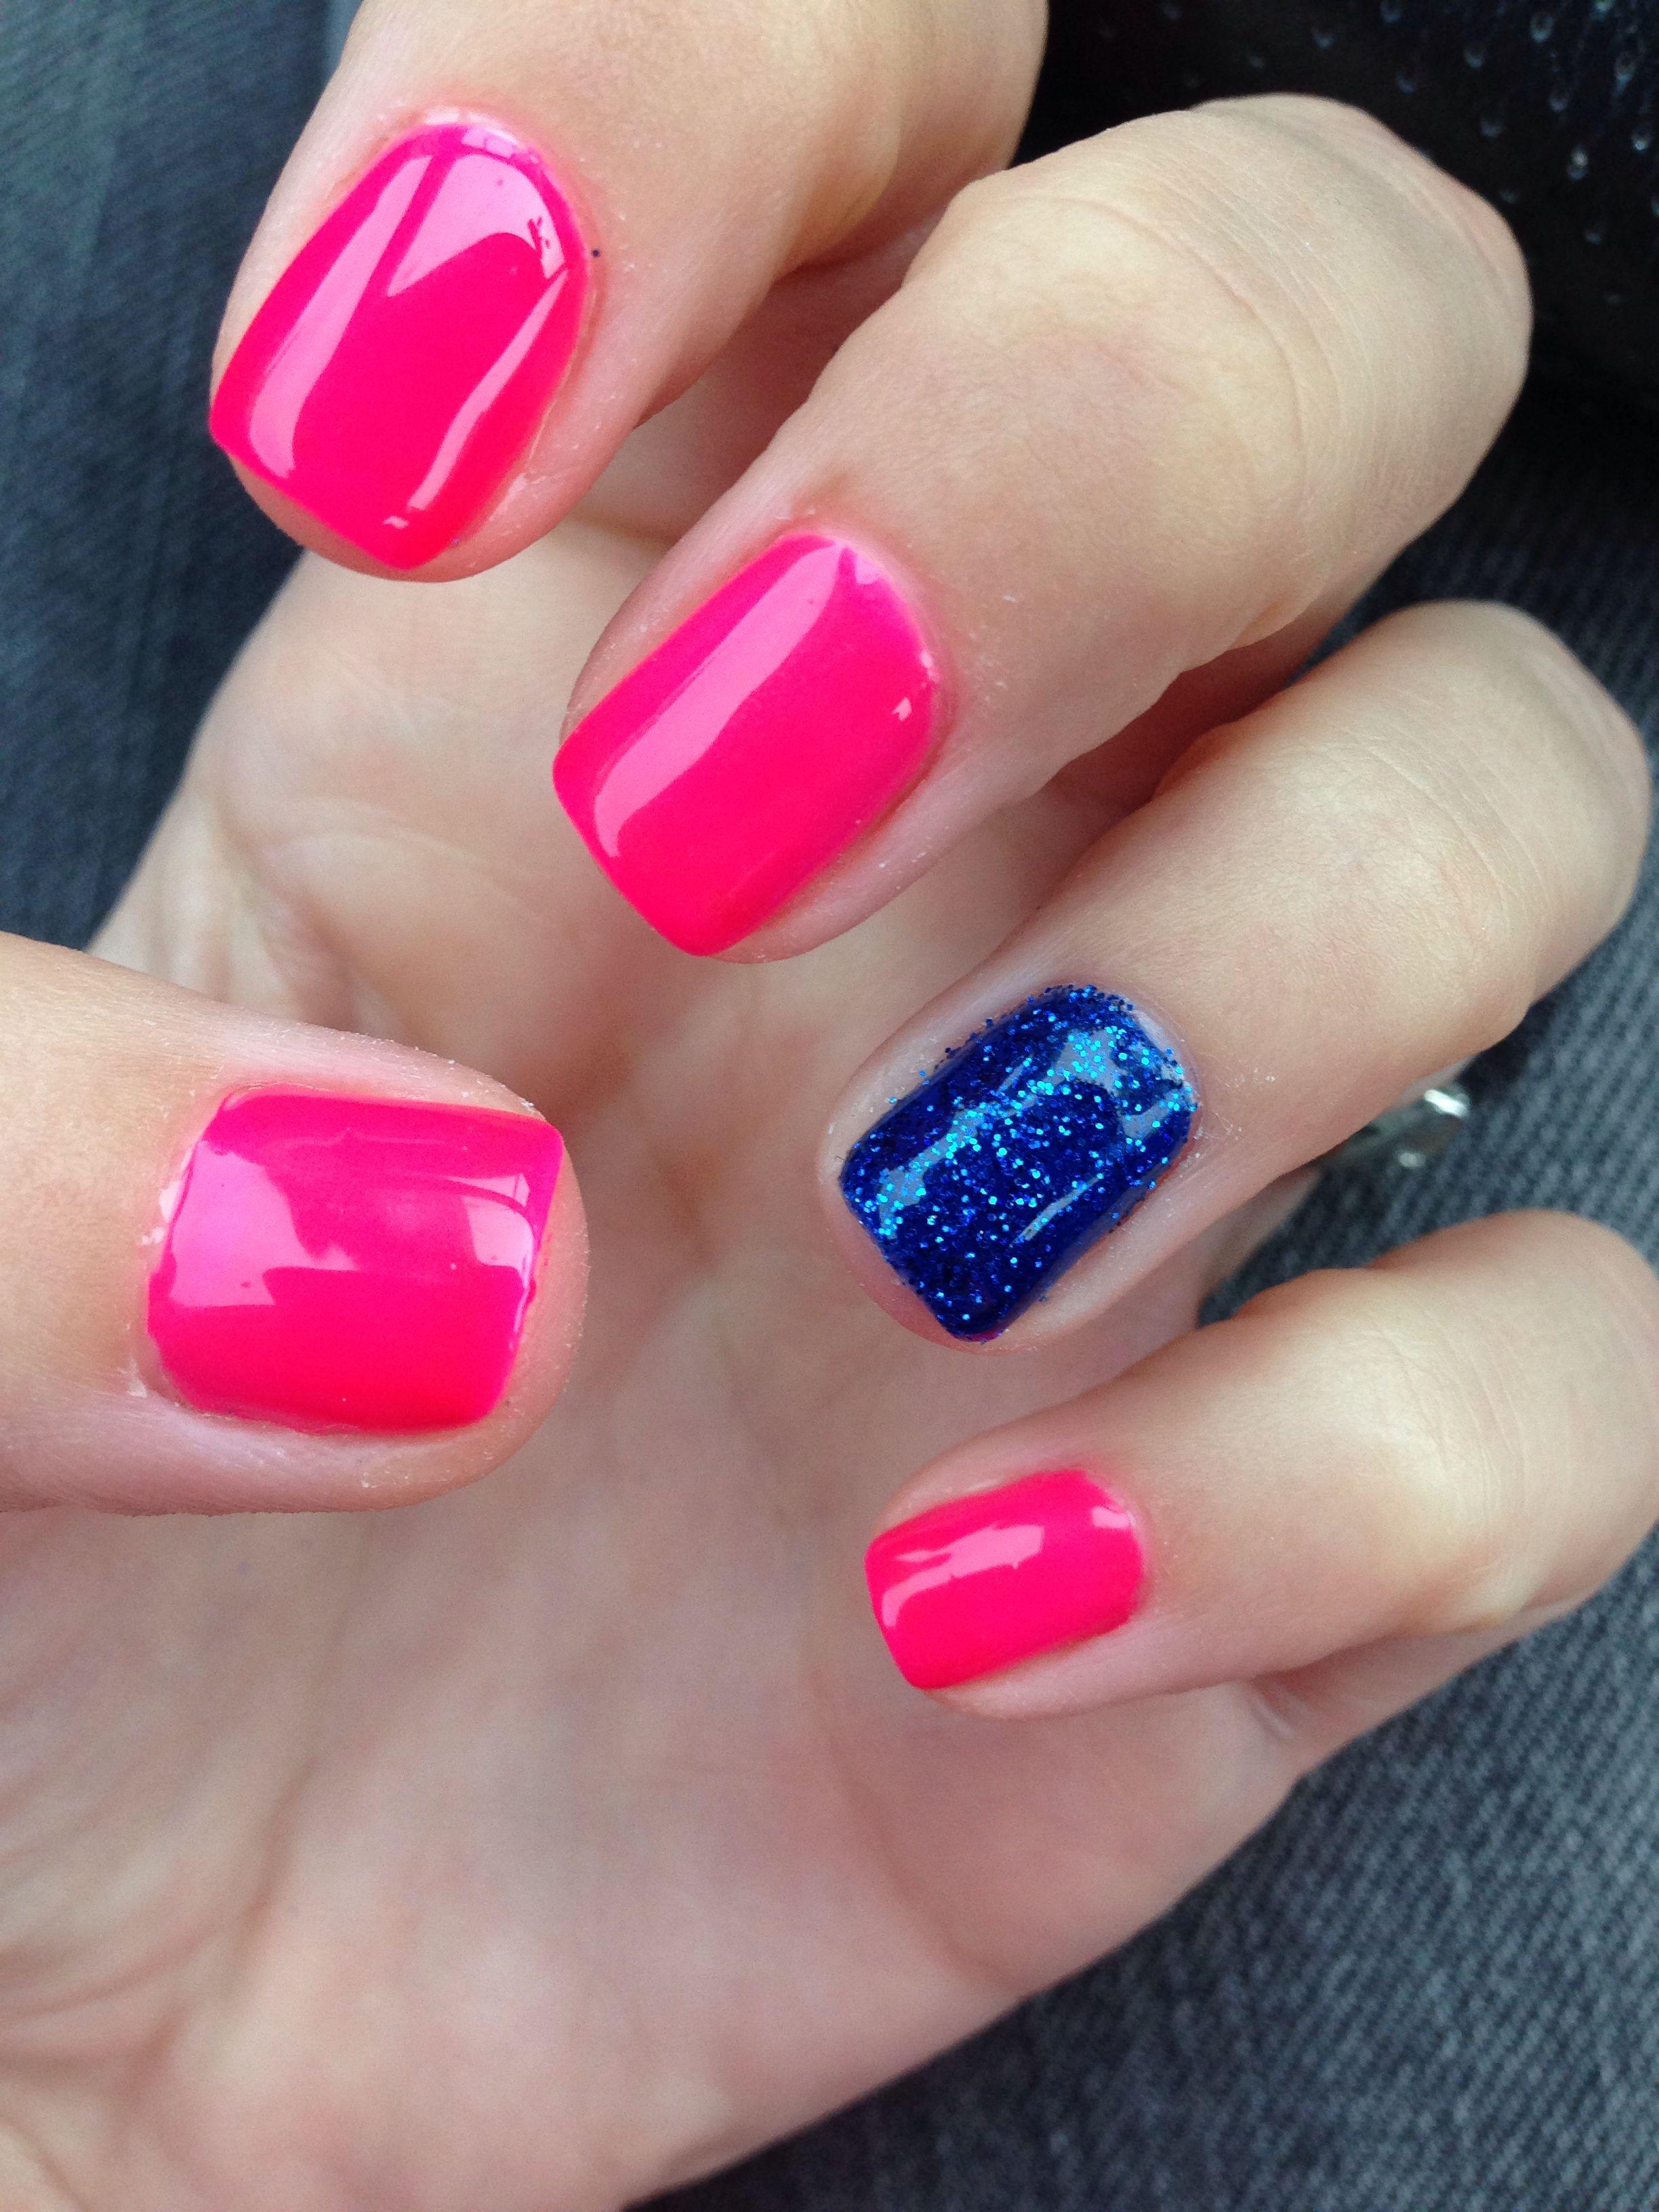 Hot Pink Shellac And Navy Blue Powder Glitter Powder Glitter